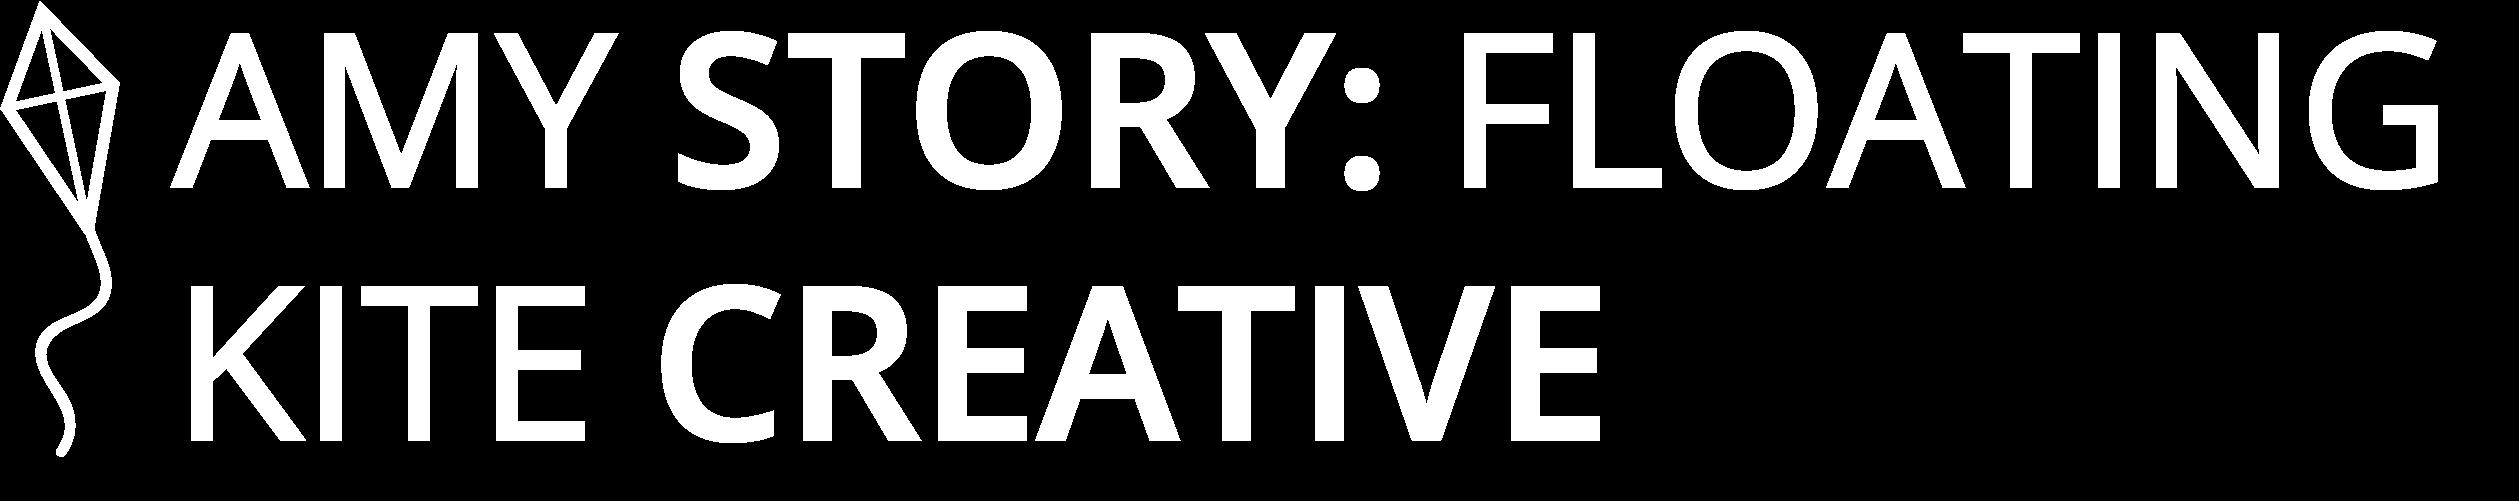 Amy Story: Floating Kite Creative